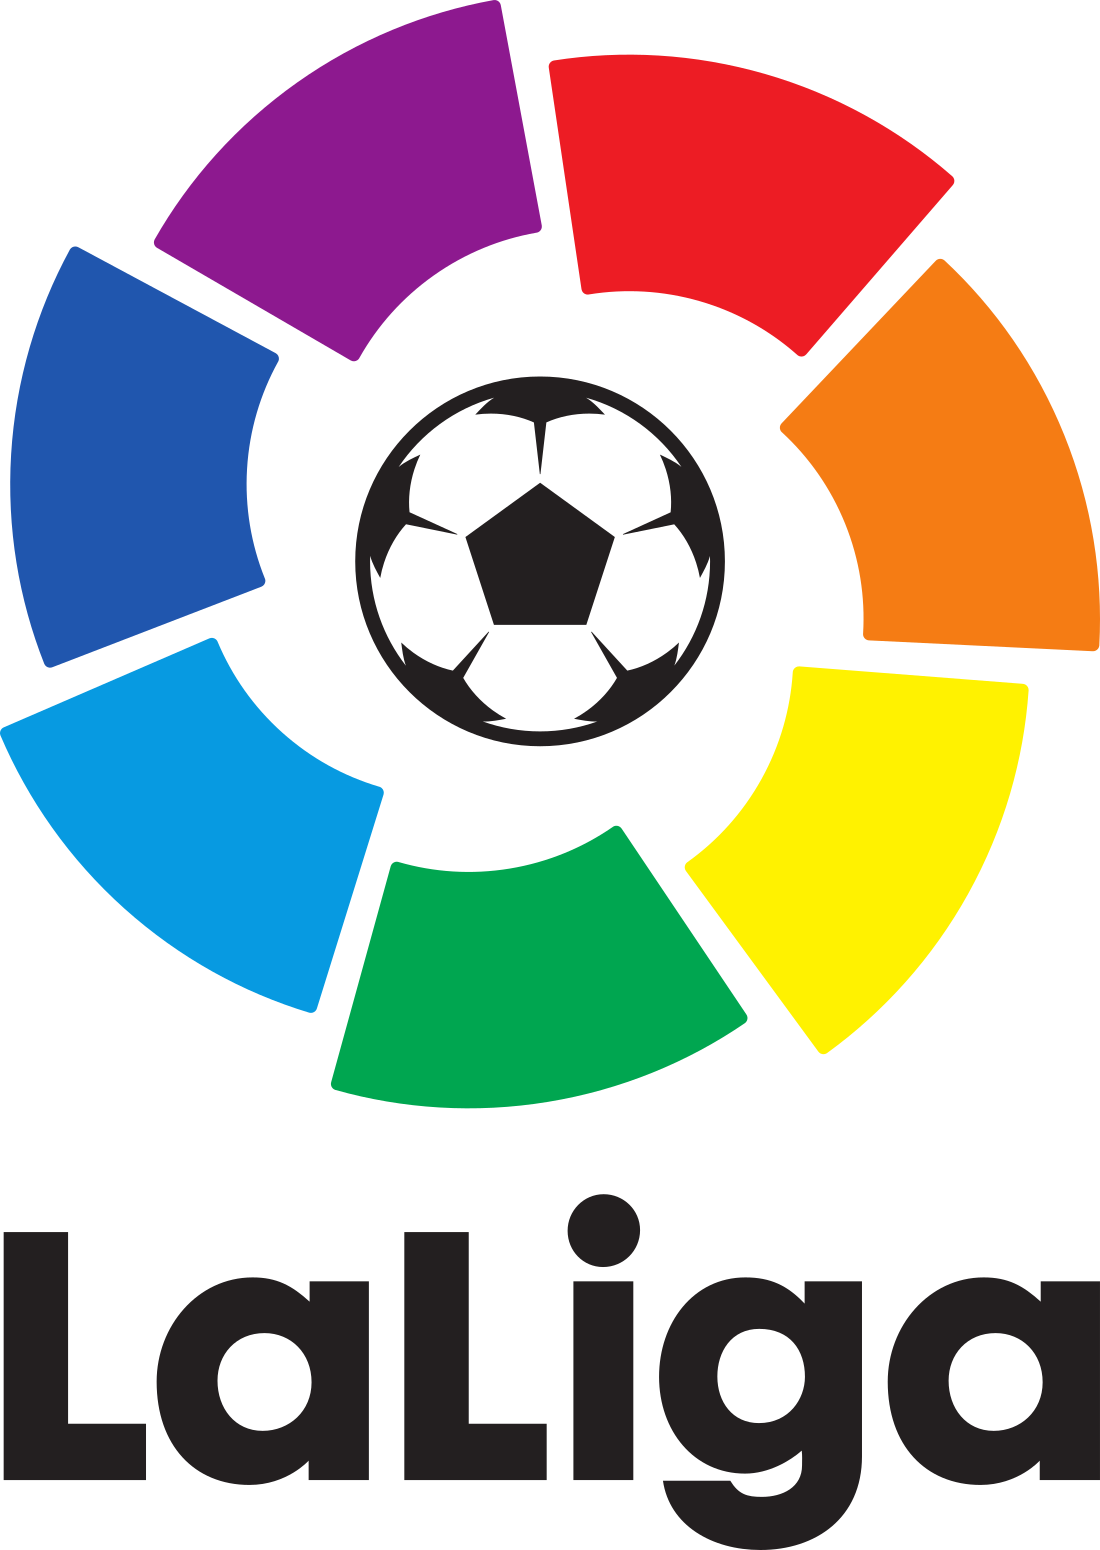 laliga logo 6 - LaLiga Logo – Campeonato Español de Fútbol